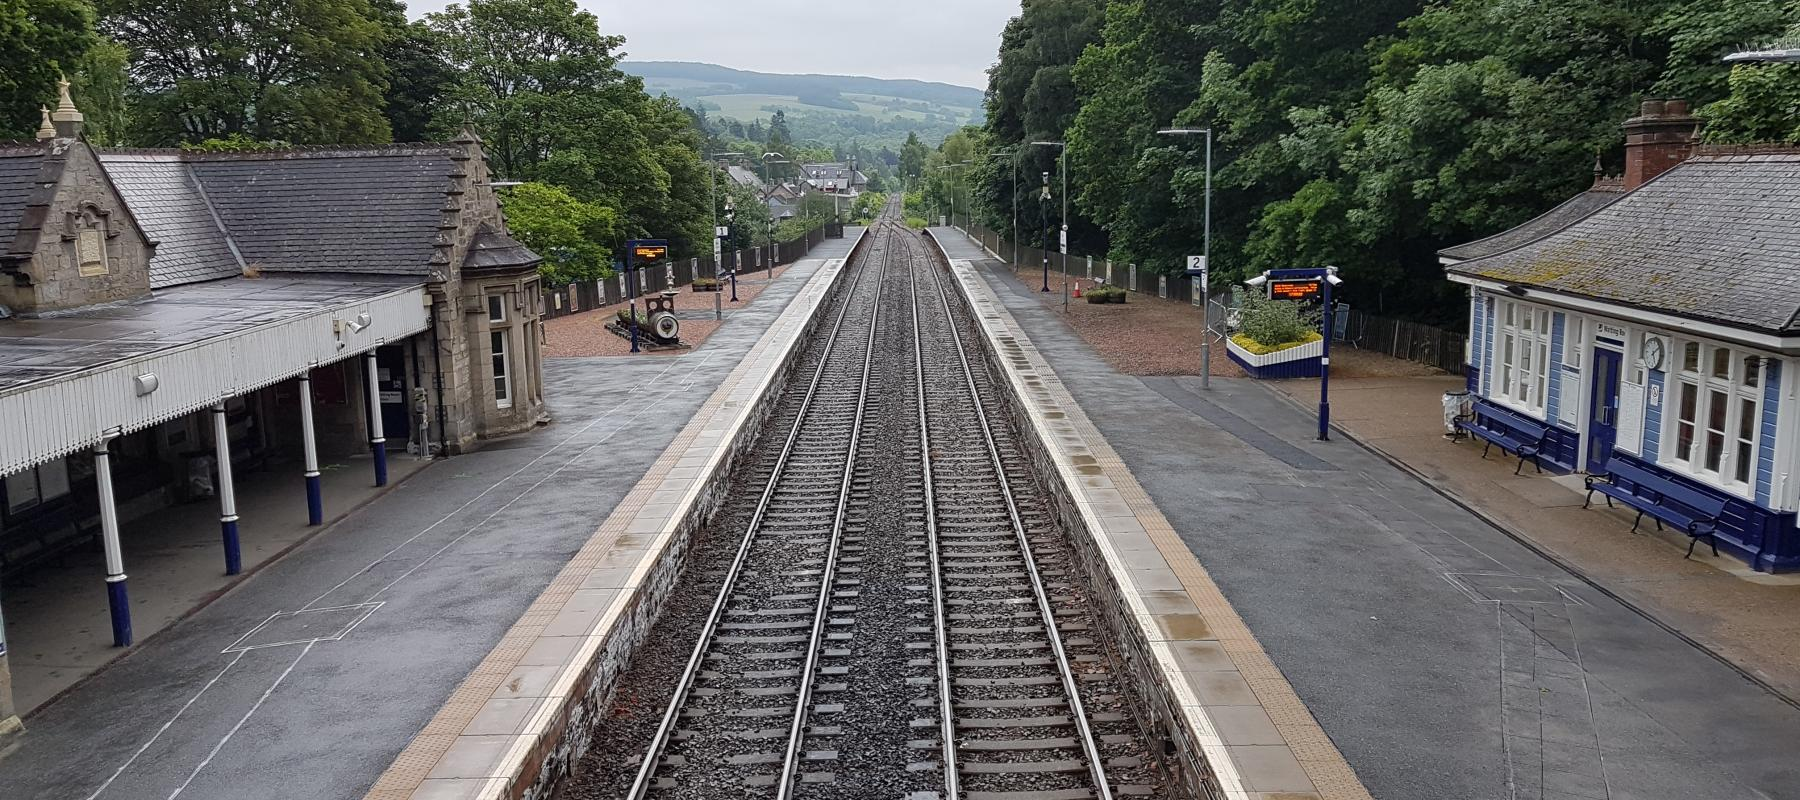 ScotRail Train travelling on the Horseshoe Viaduct along the Highland Line, Scotland